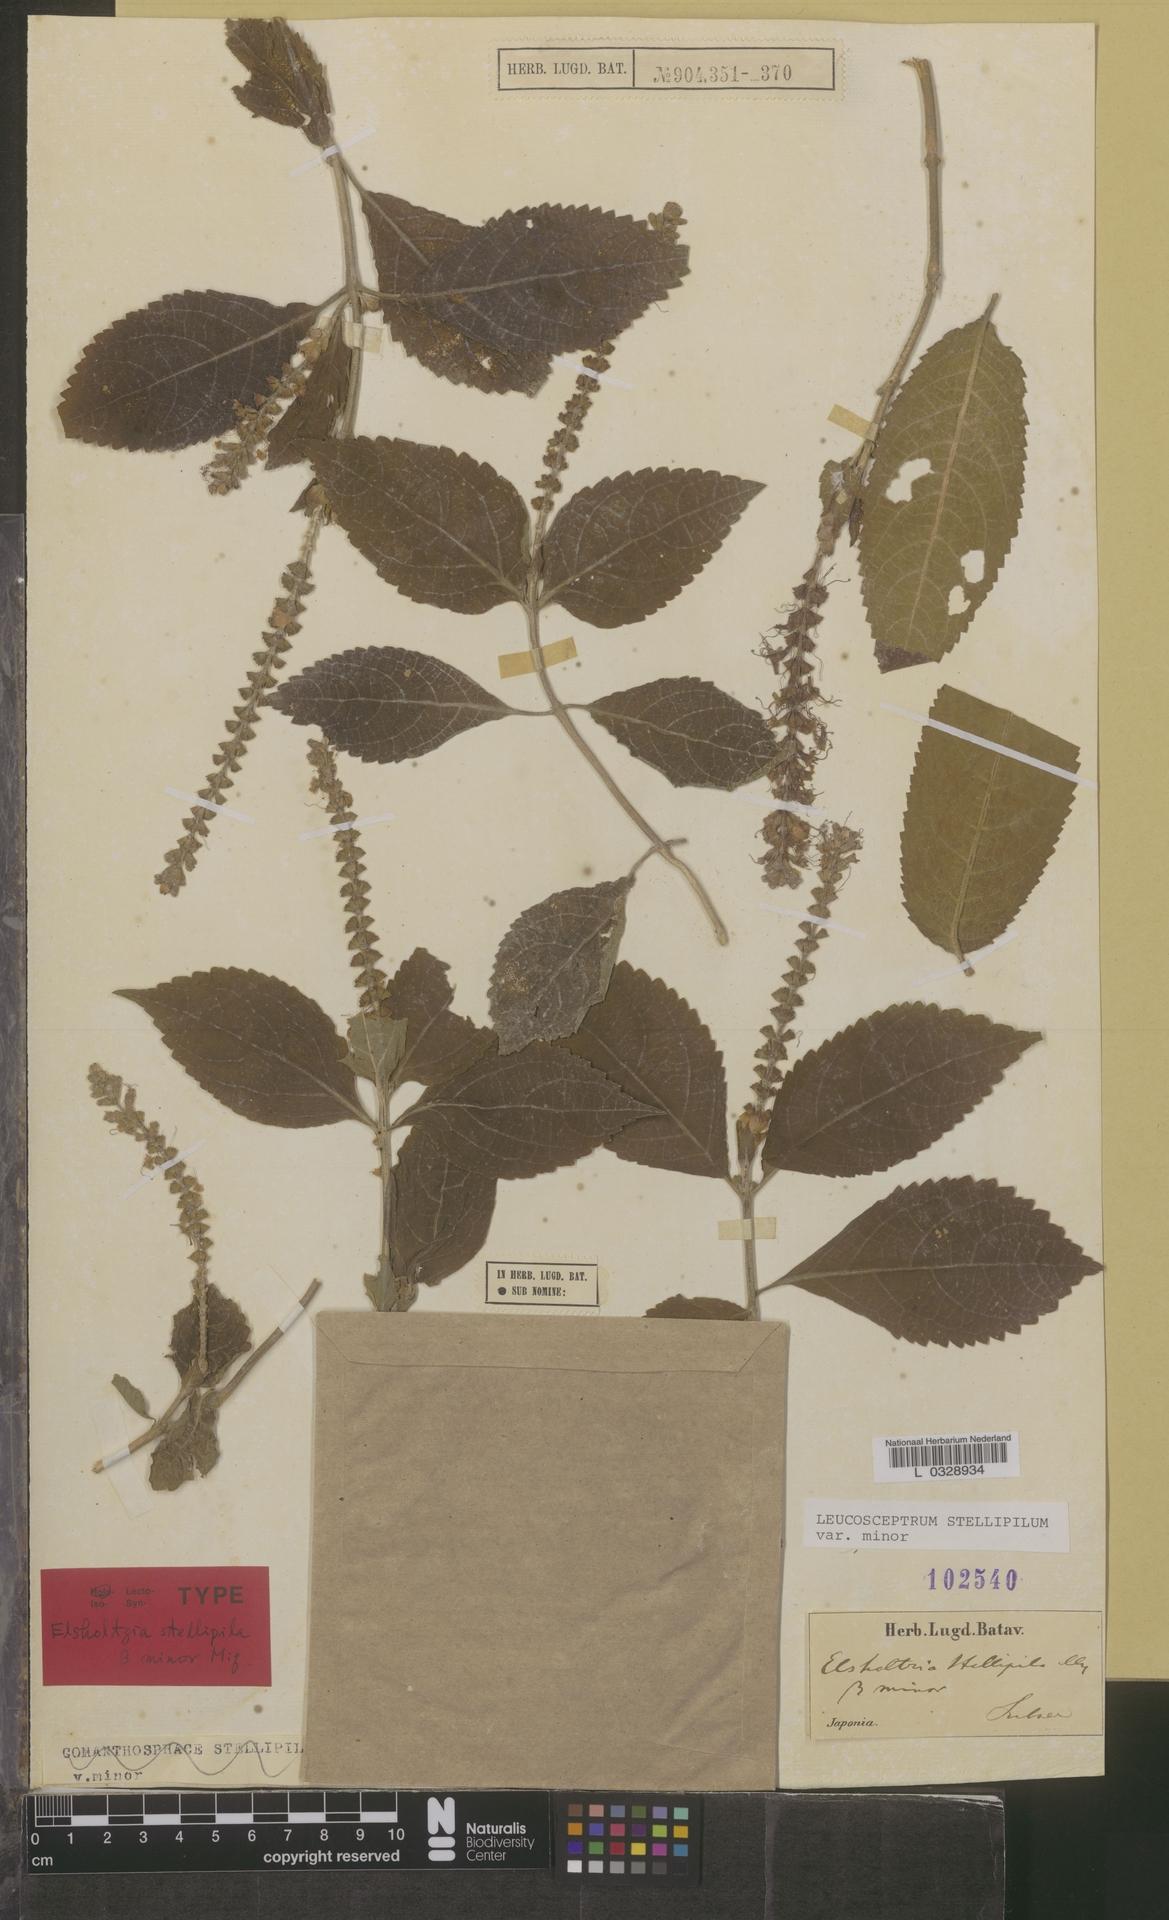 L  0328934 | Leucosceptrum stellipilum var. minor